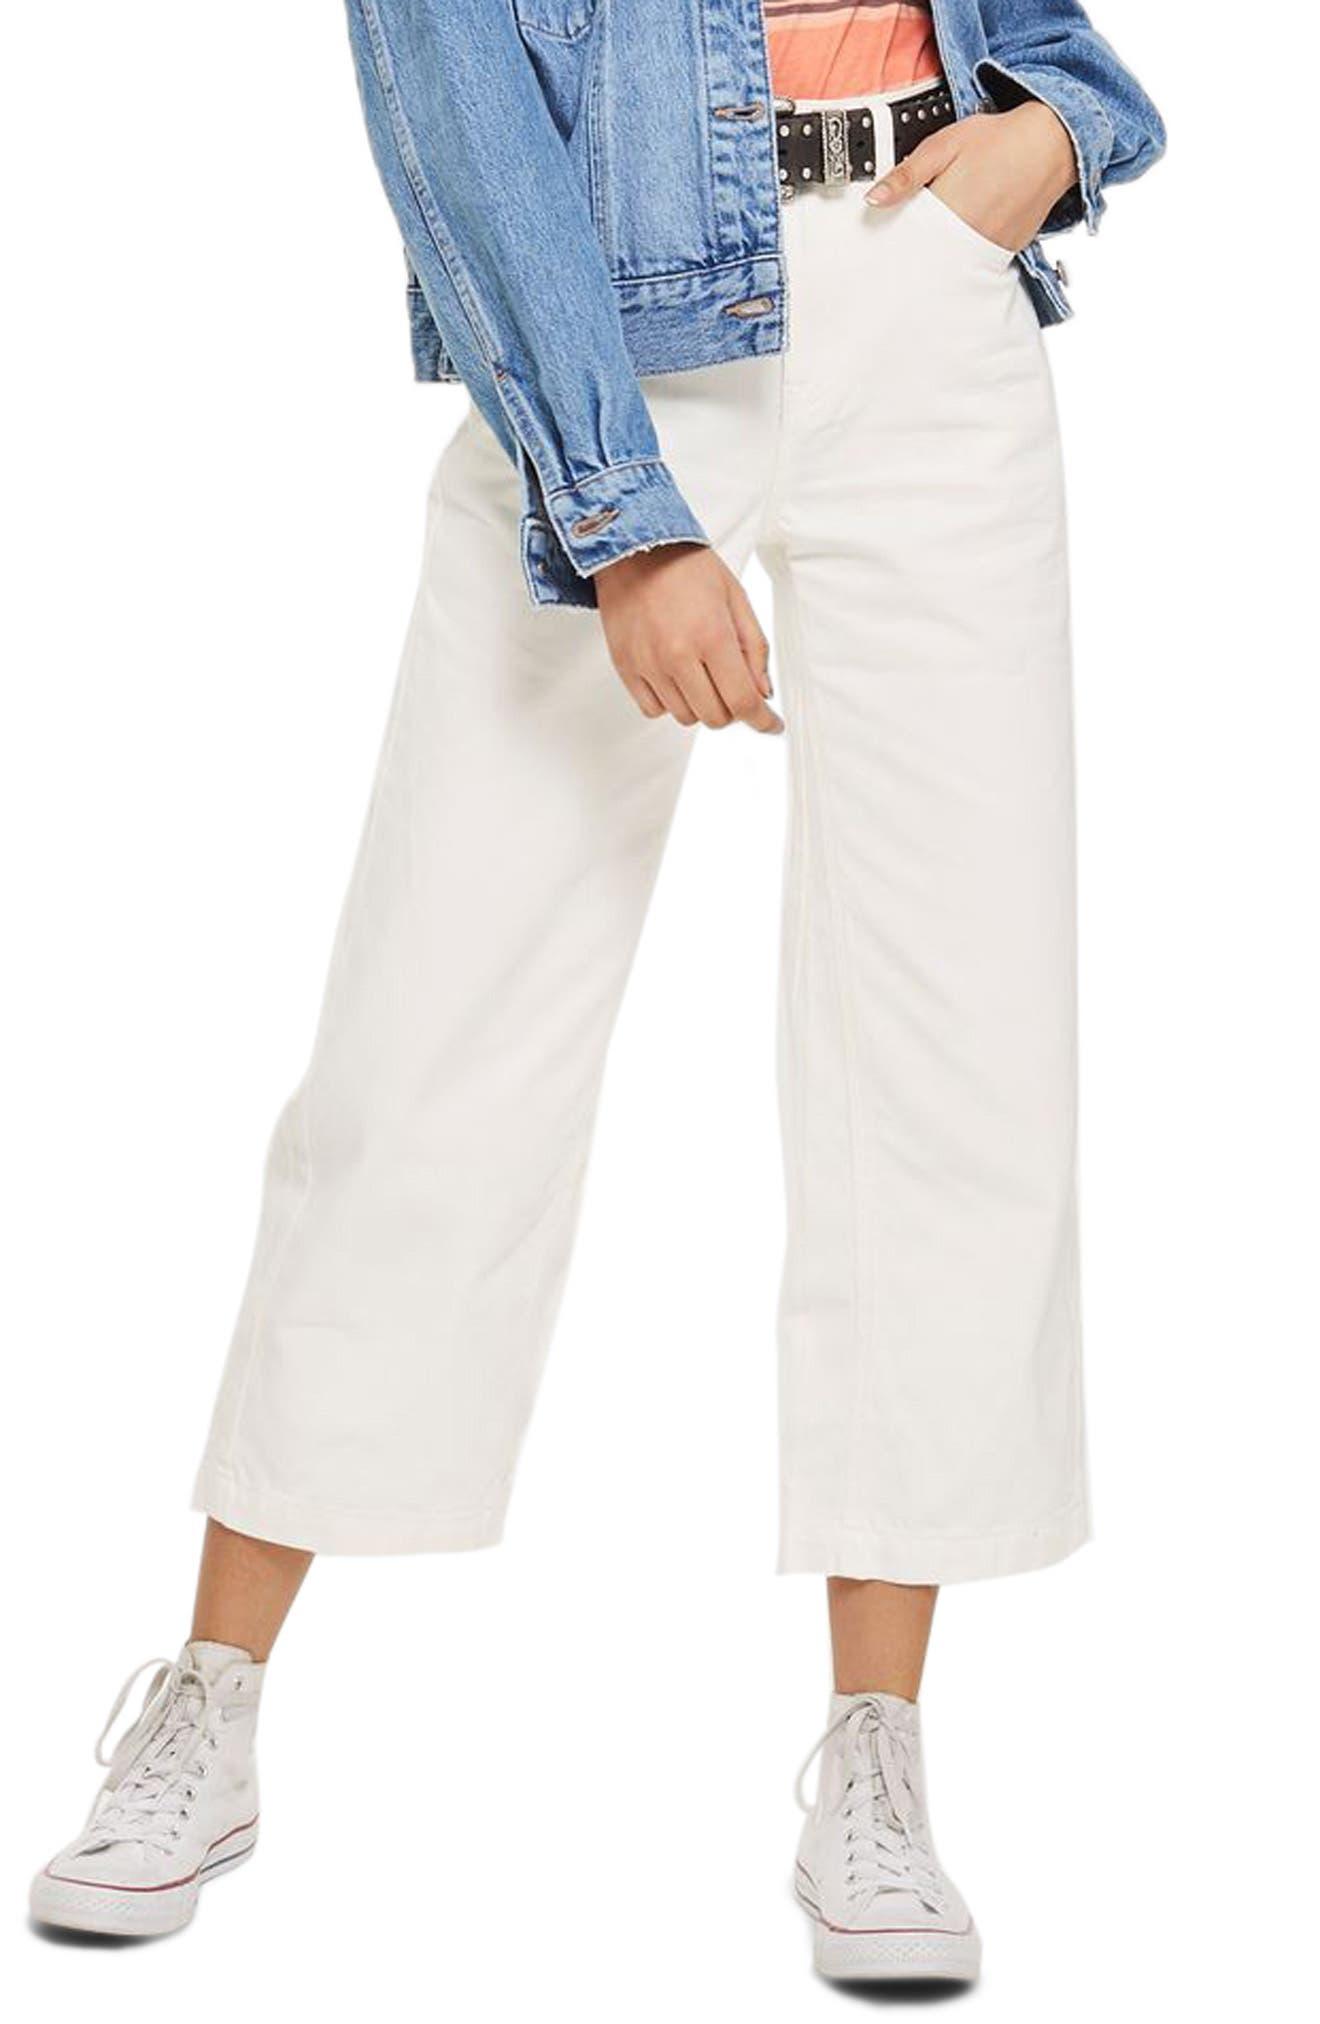 MOTO Cropped Wide Leg Non-Stretch Jeans,                             Main thumbnail 1, color,                             White